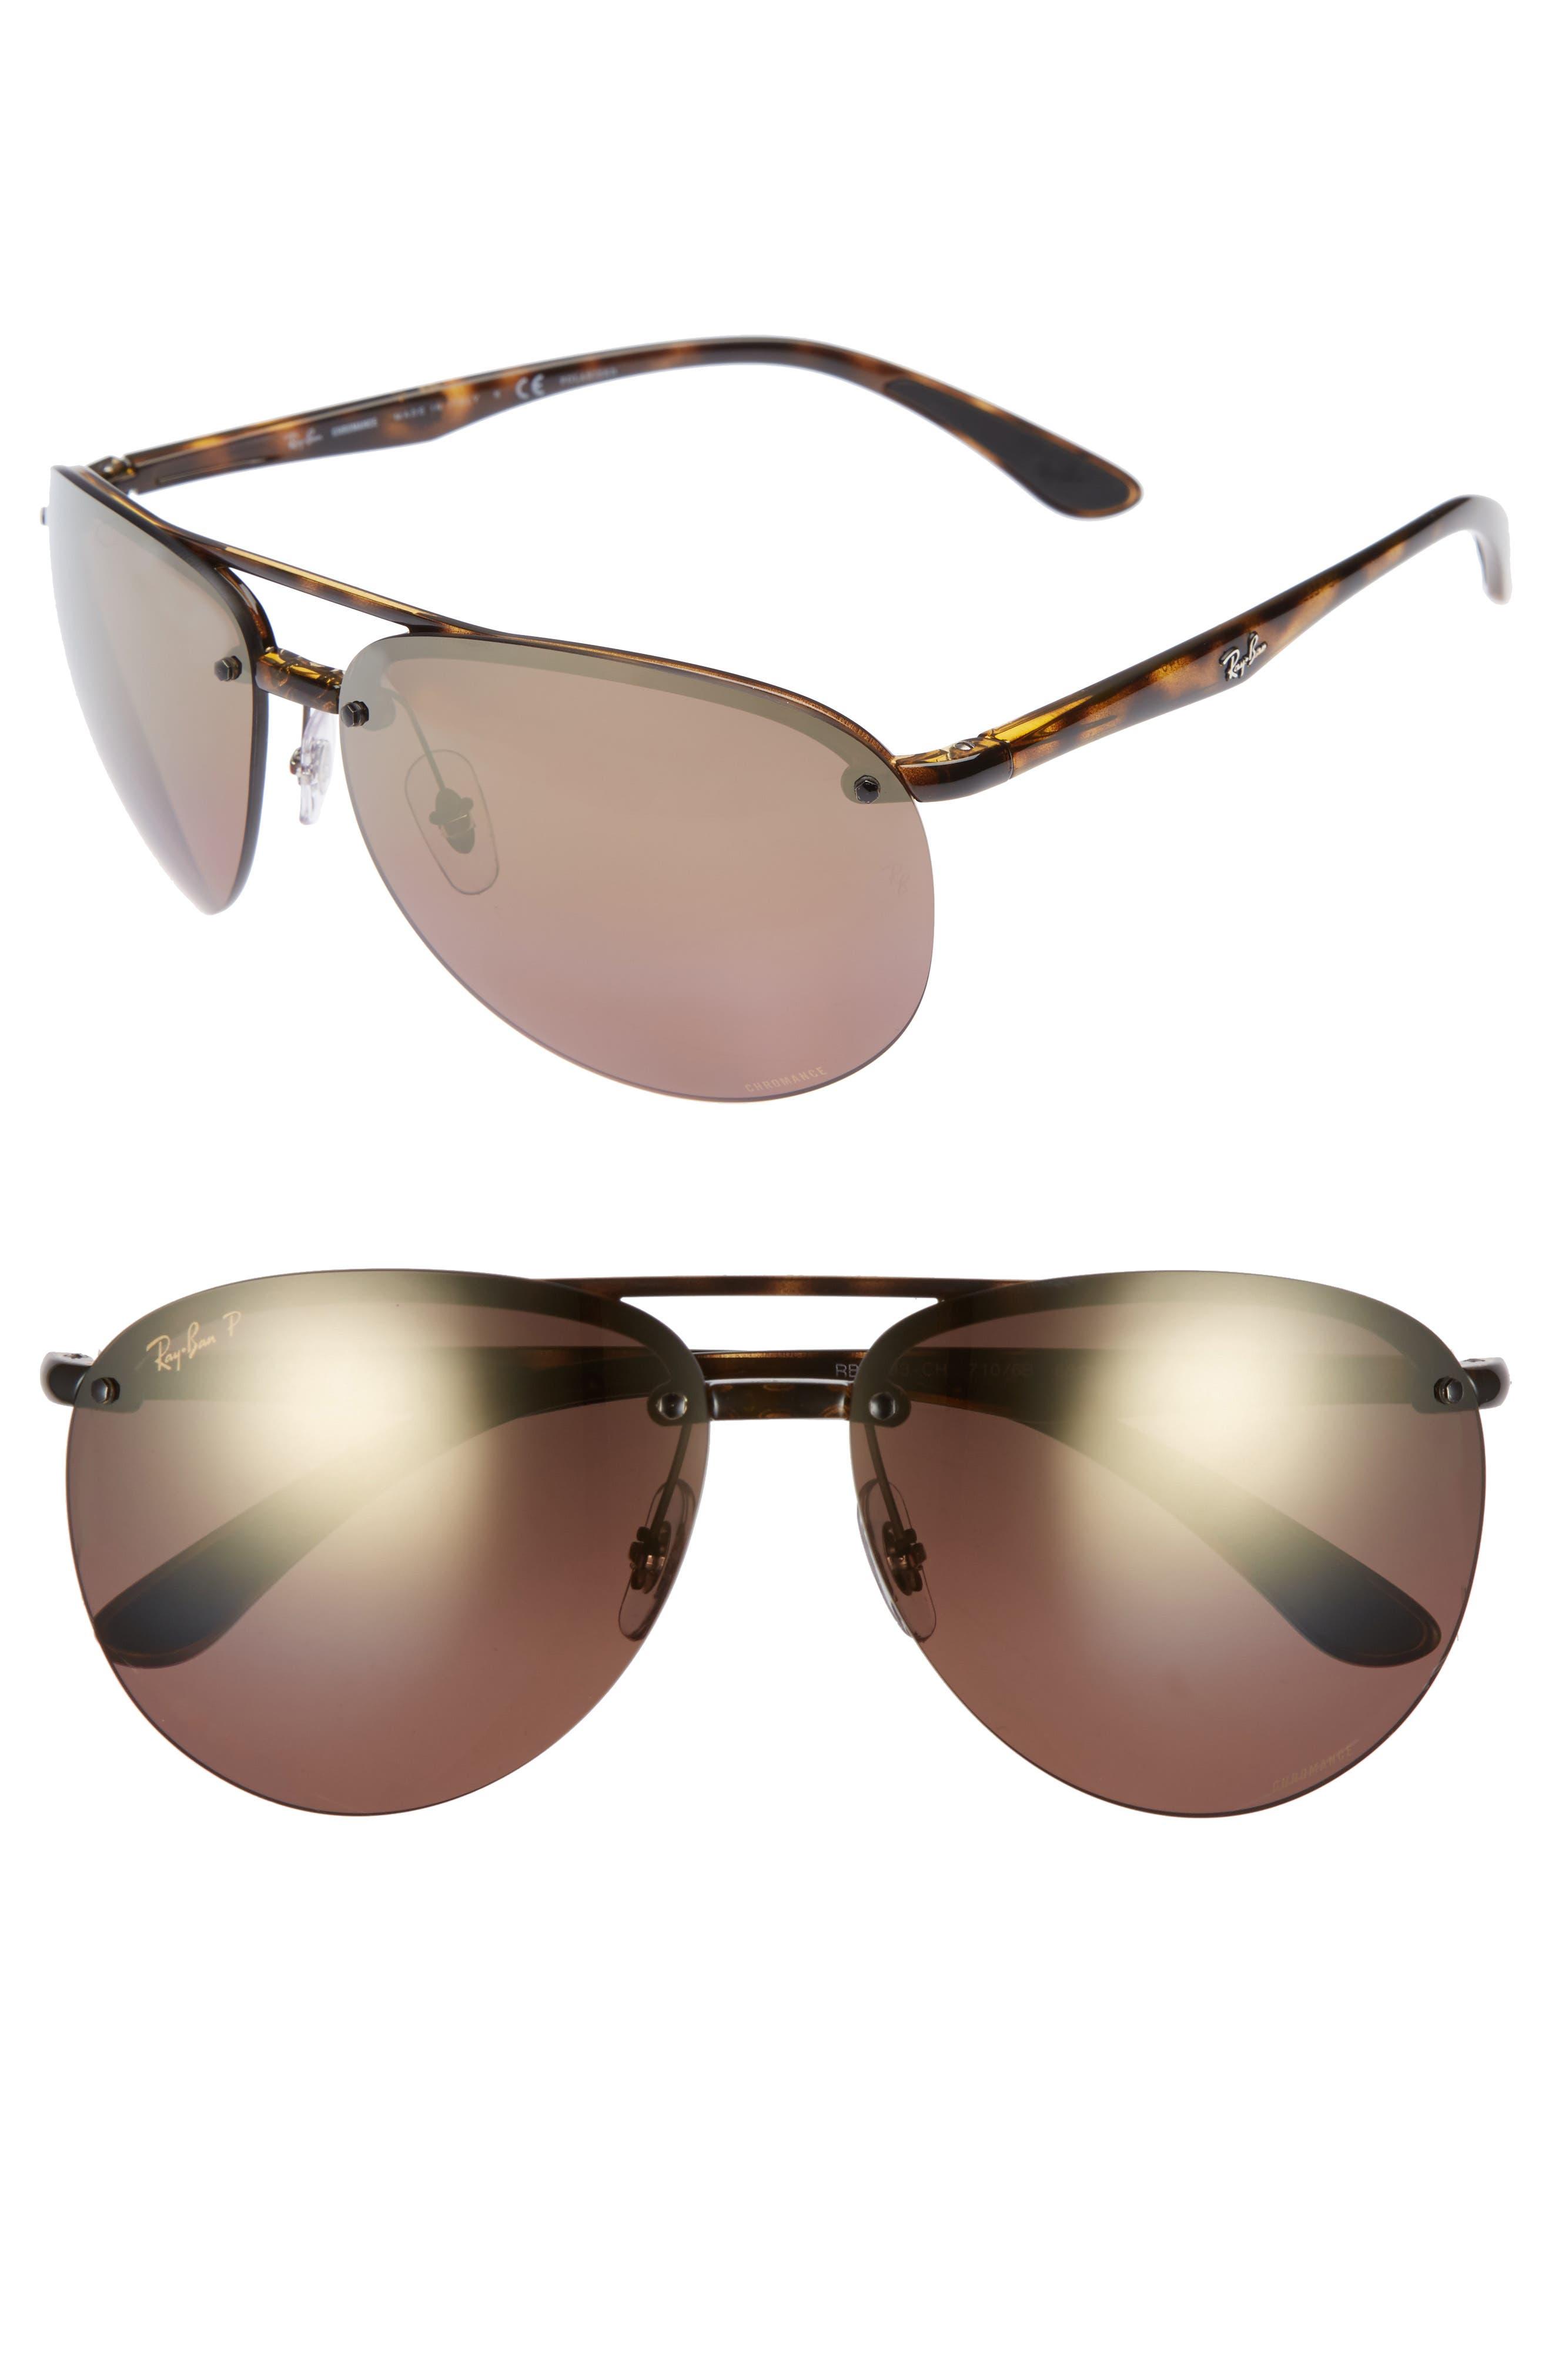 65mm Gradient Aviator Sunglasses,                             Main thumbnail 1, color,                             200